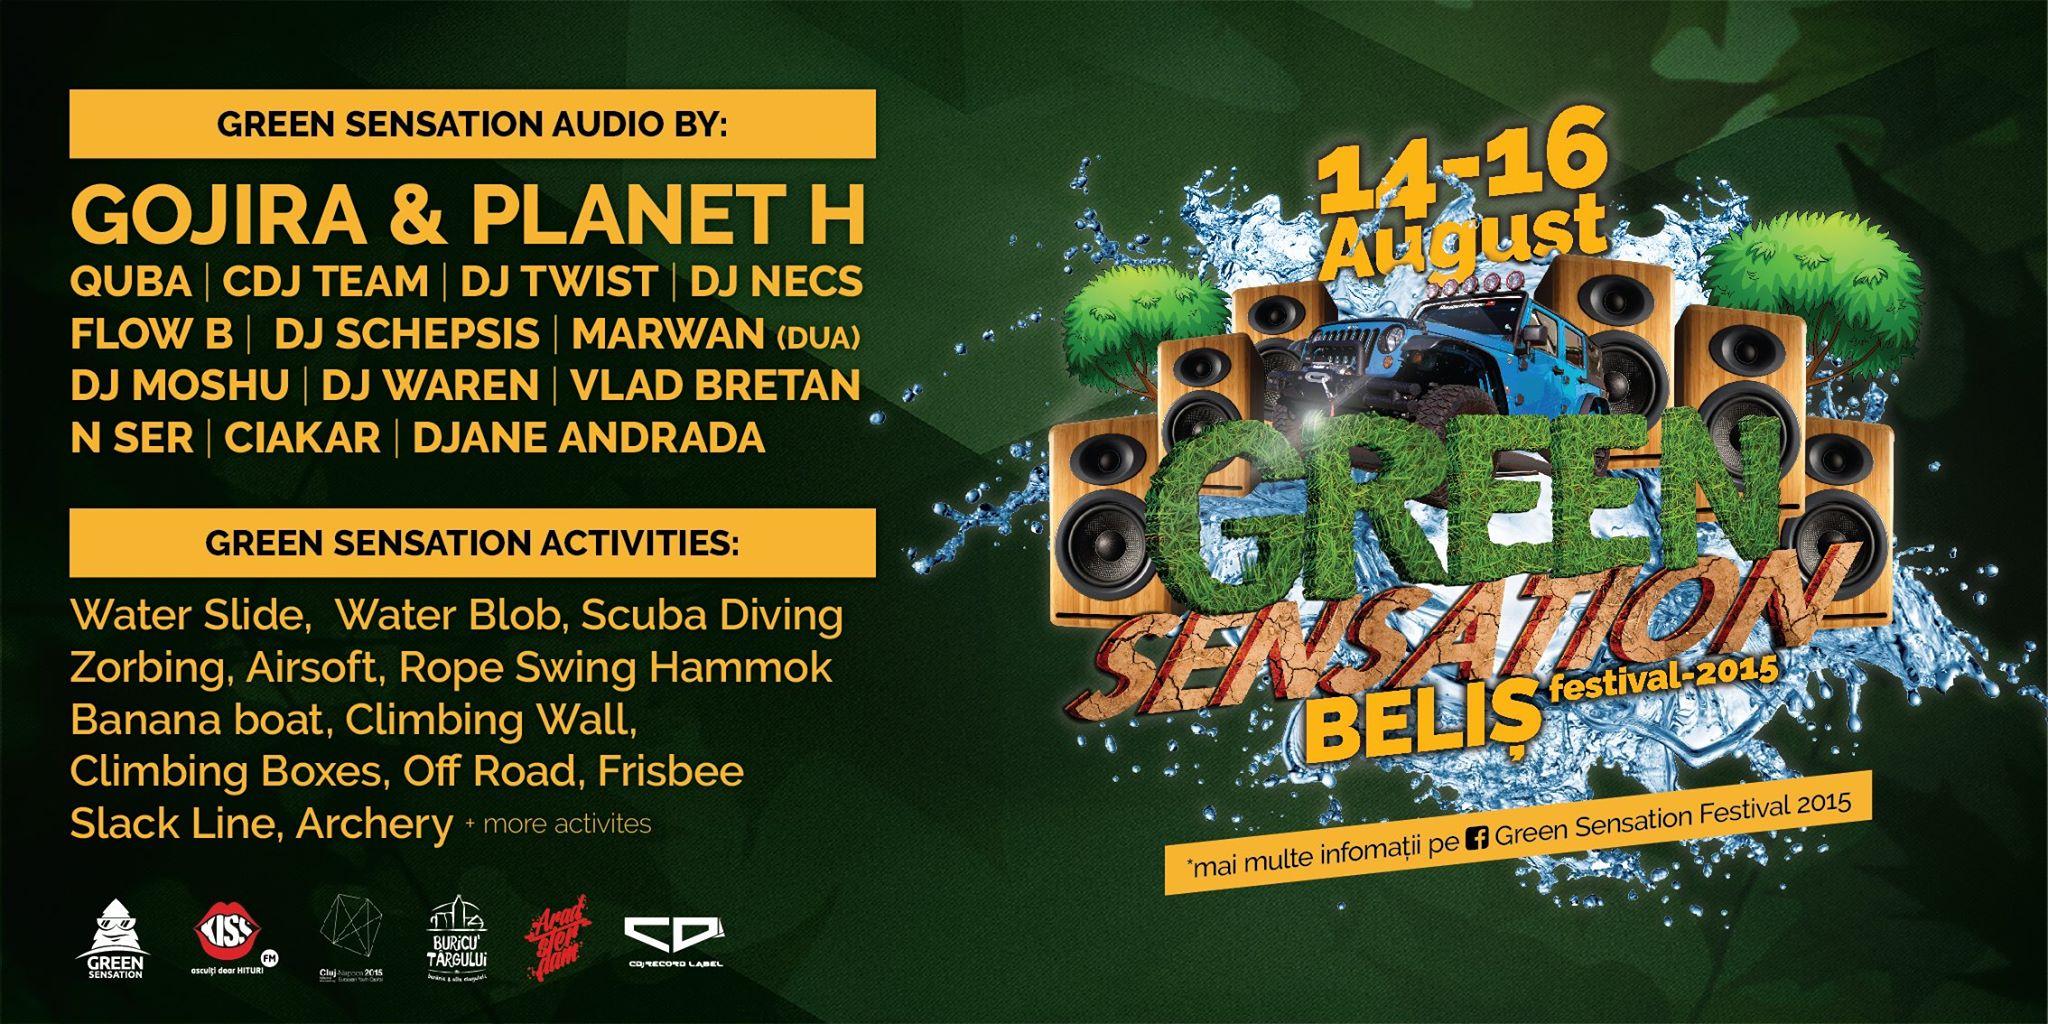 Green Sensation Festival 2015